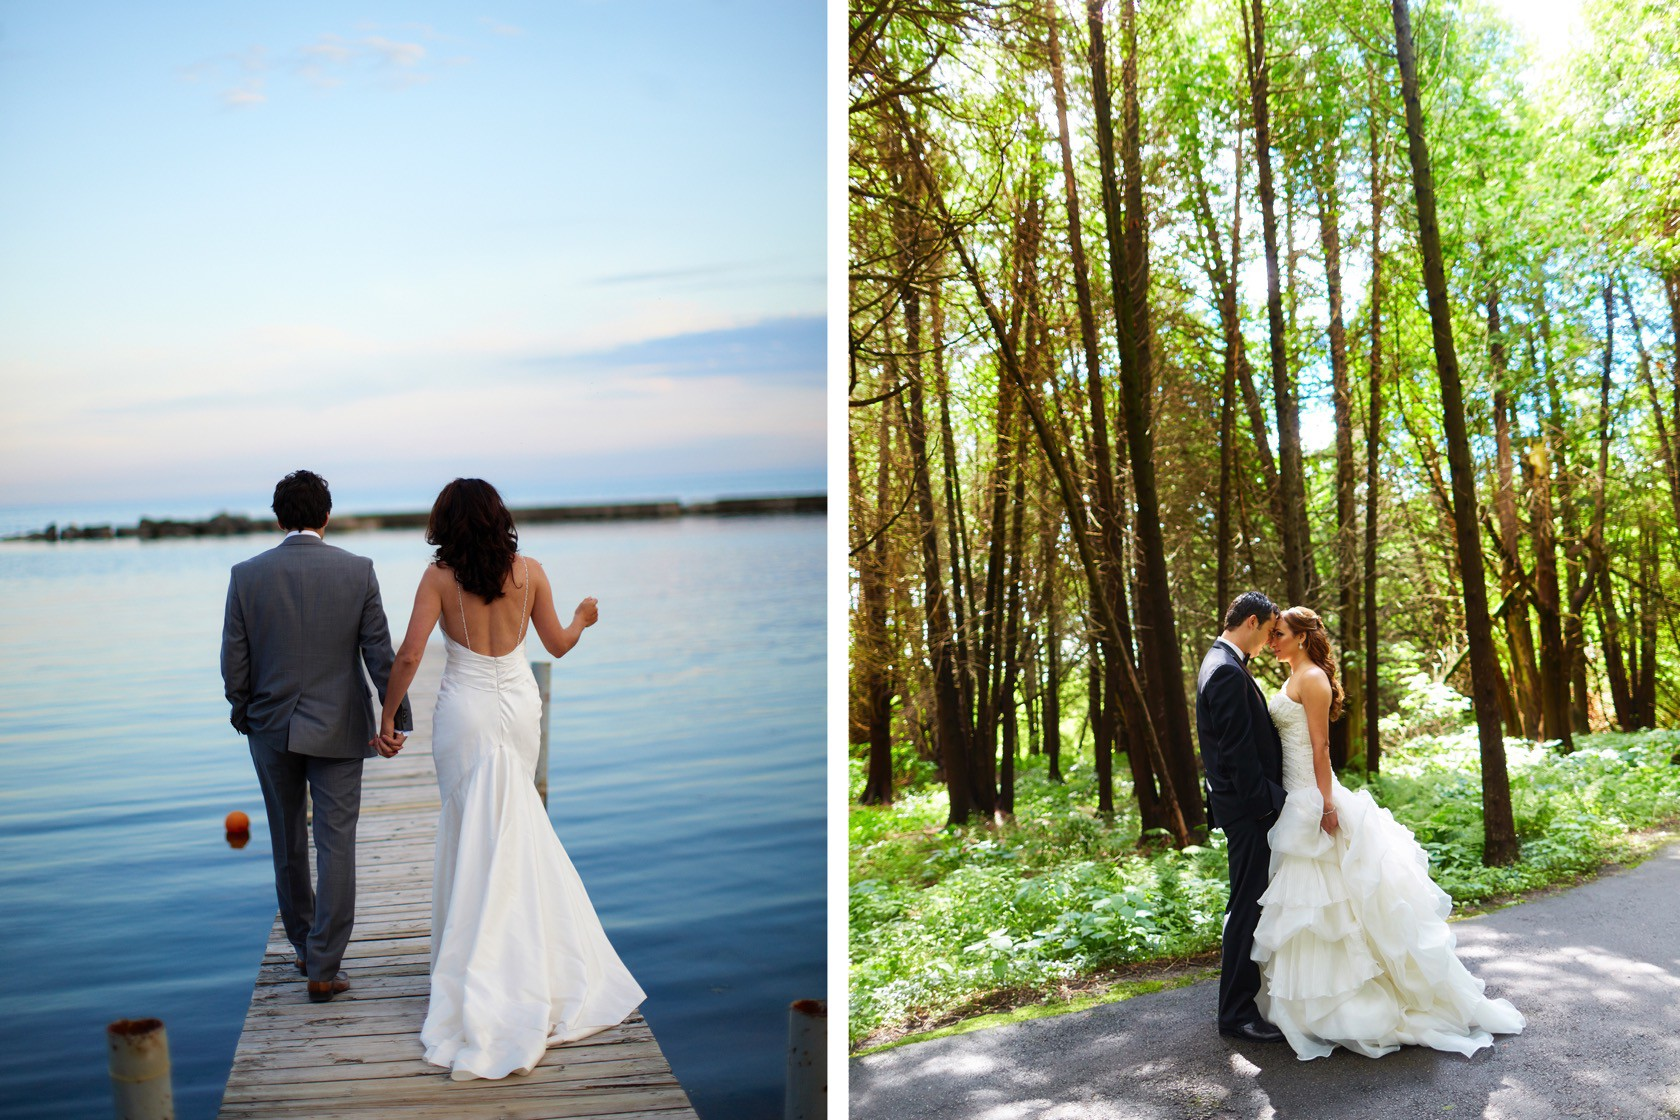 stephen sager photography 0021 fine art wedding photography